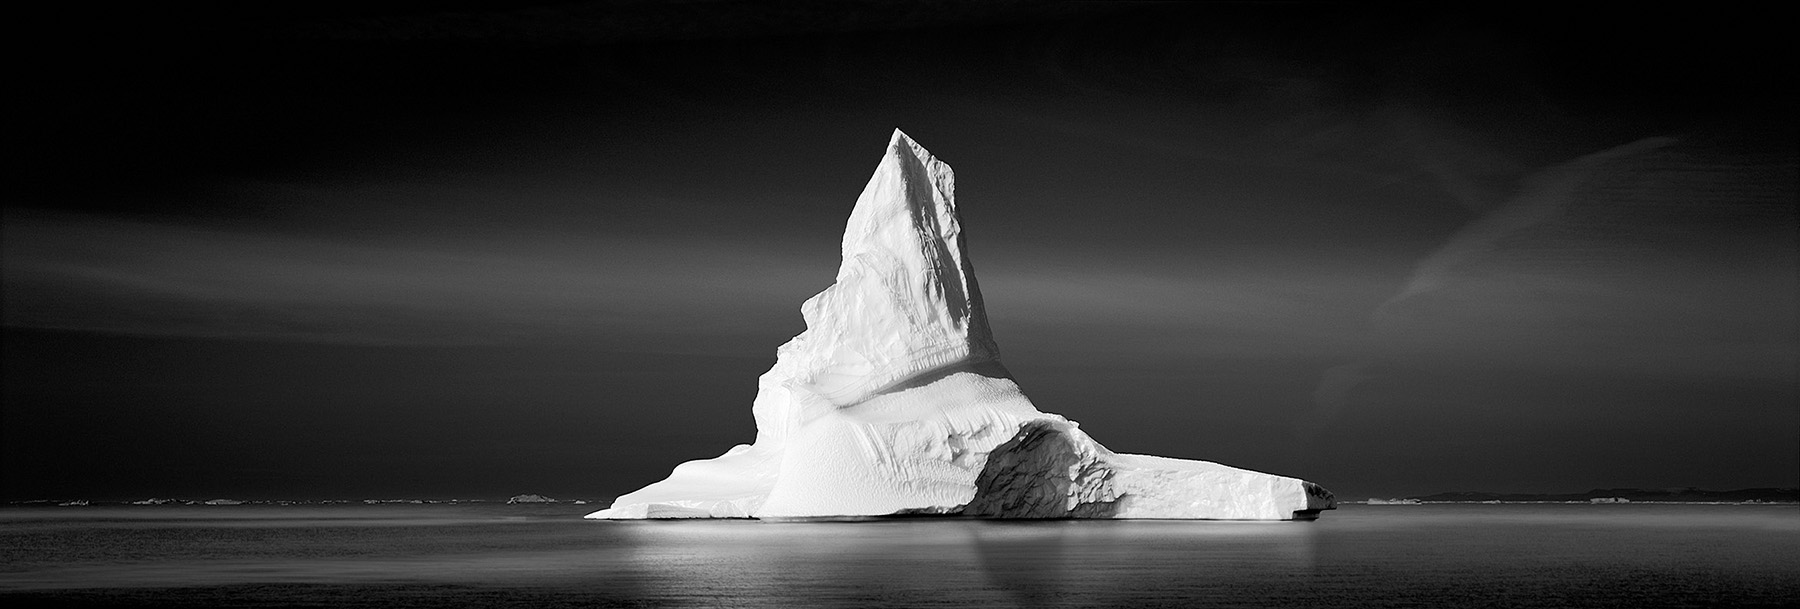 Iceberg 02, Greenland, 2007